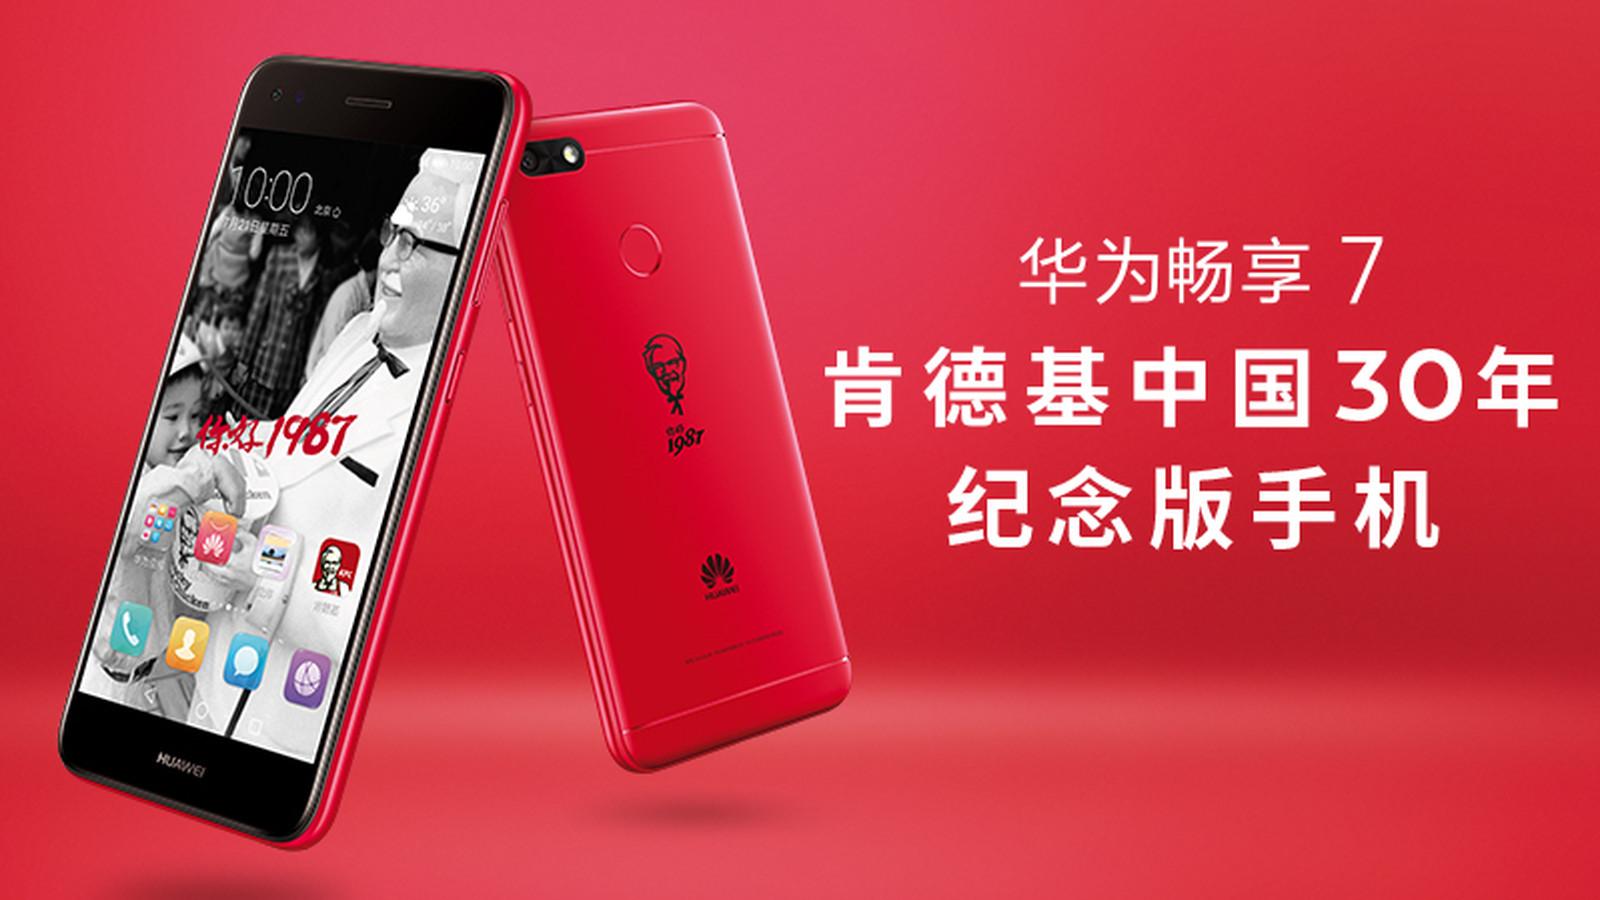 Kfc S Iphone Killer Has Arrived The Verge